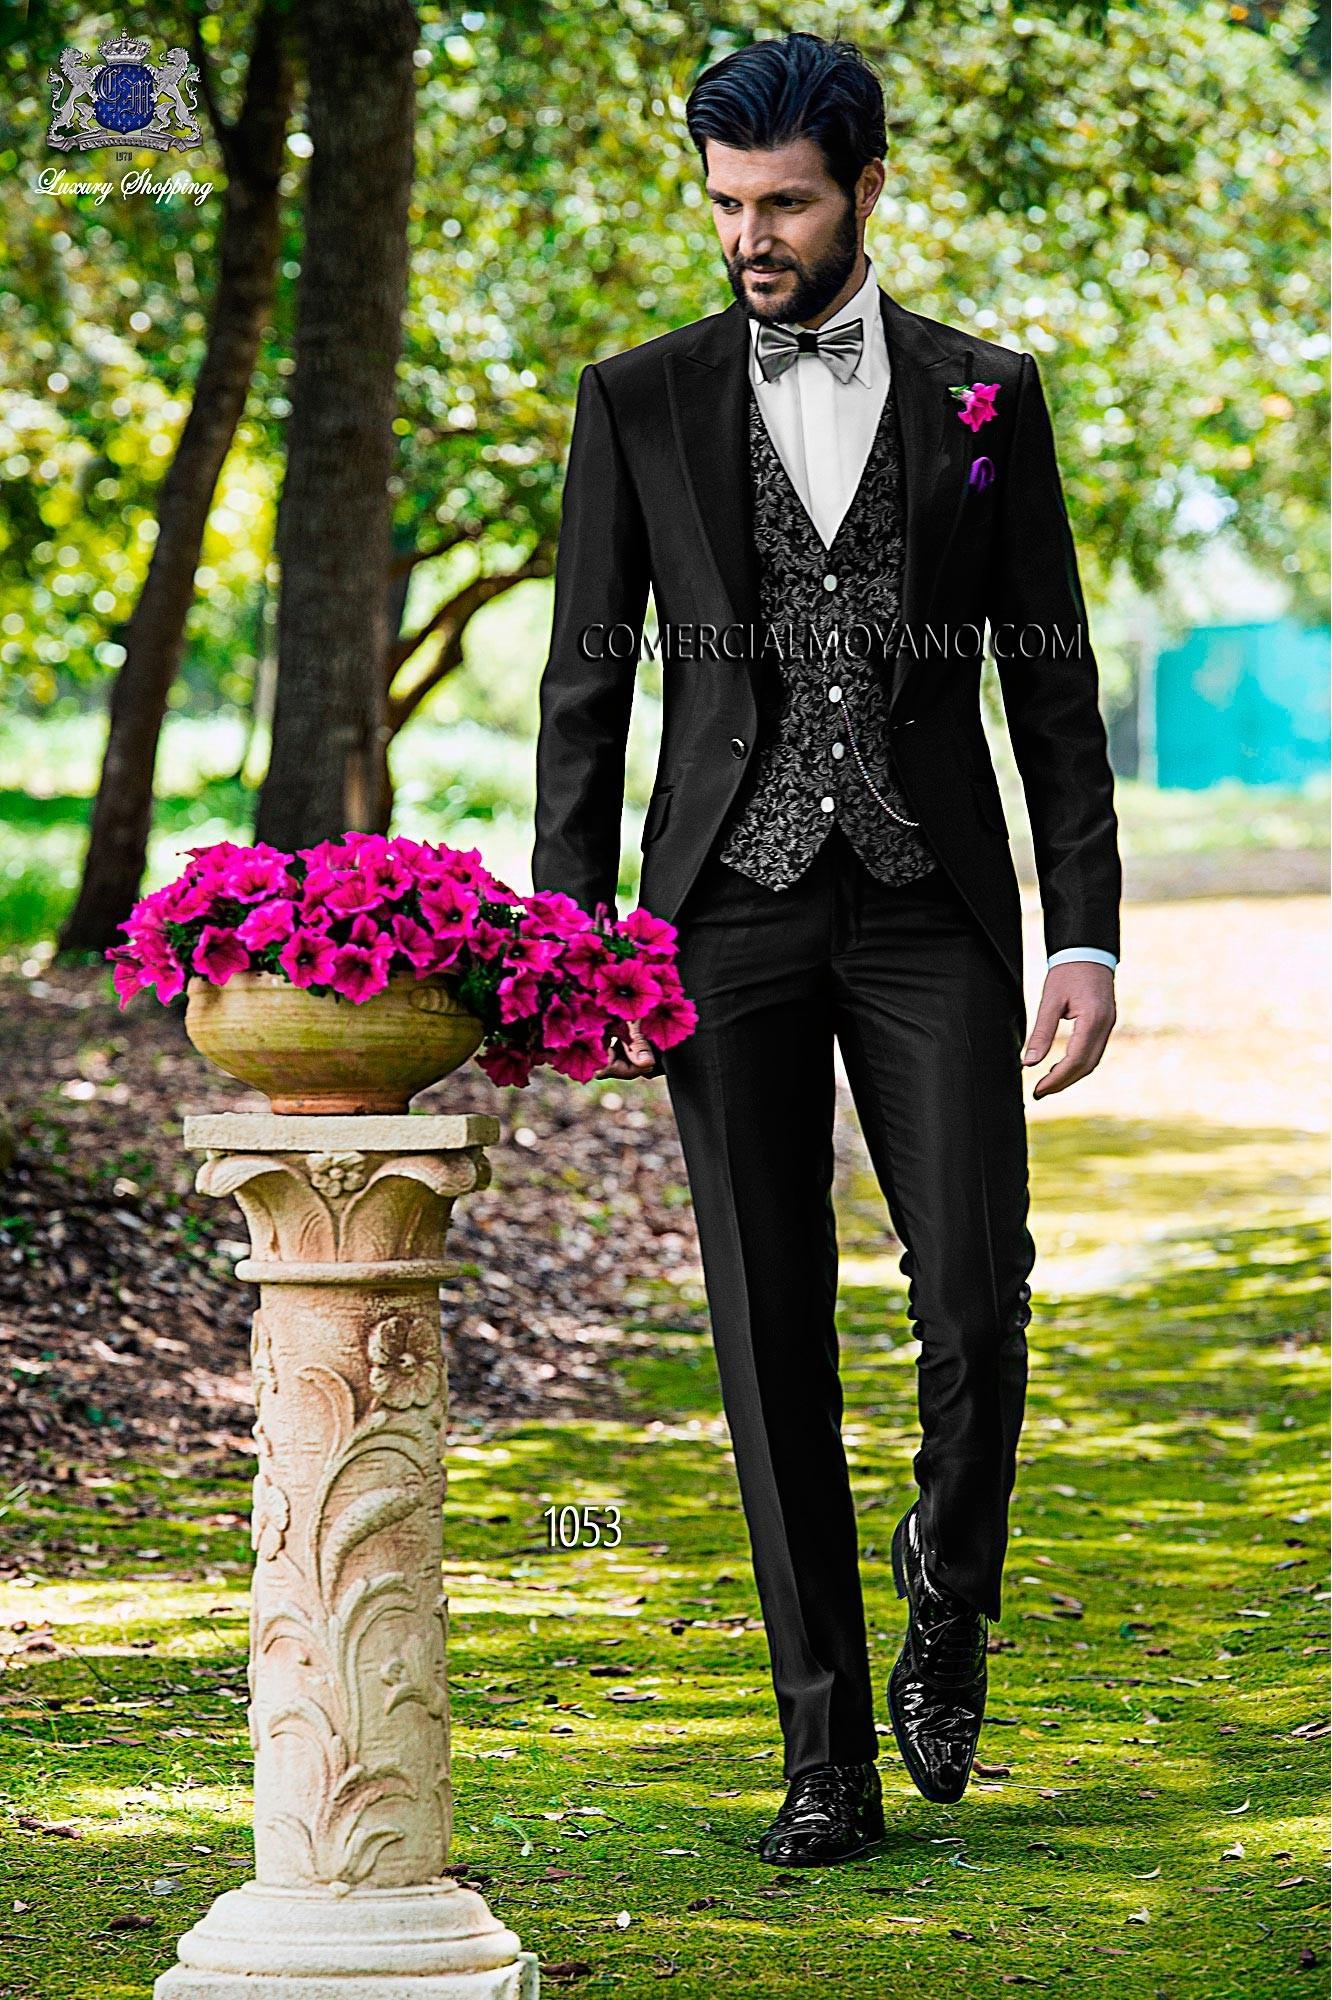 Traje de novio moderno negro modelo: 1053 Ottavio Nuccio Gala colección Fashion